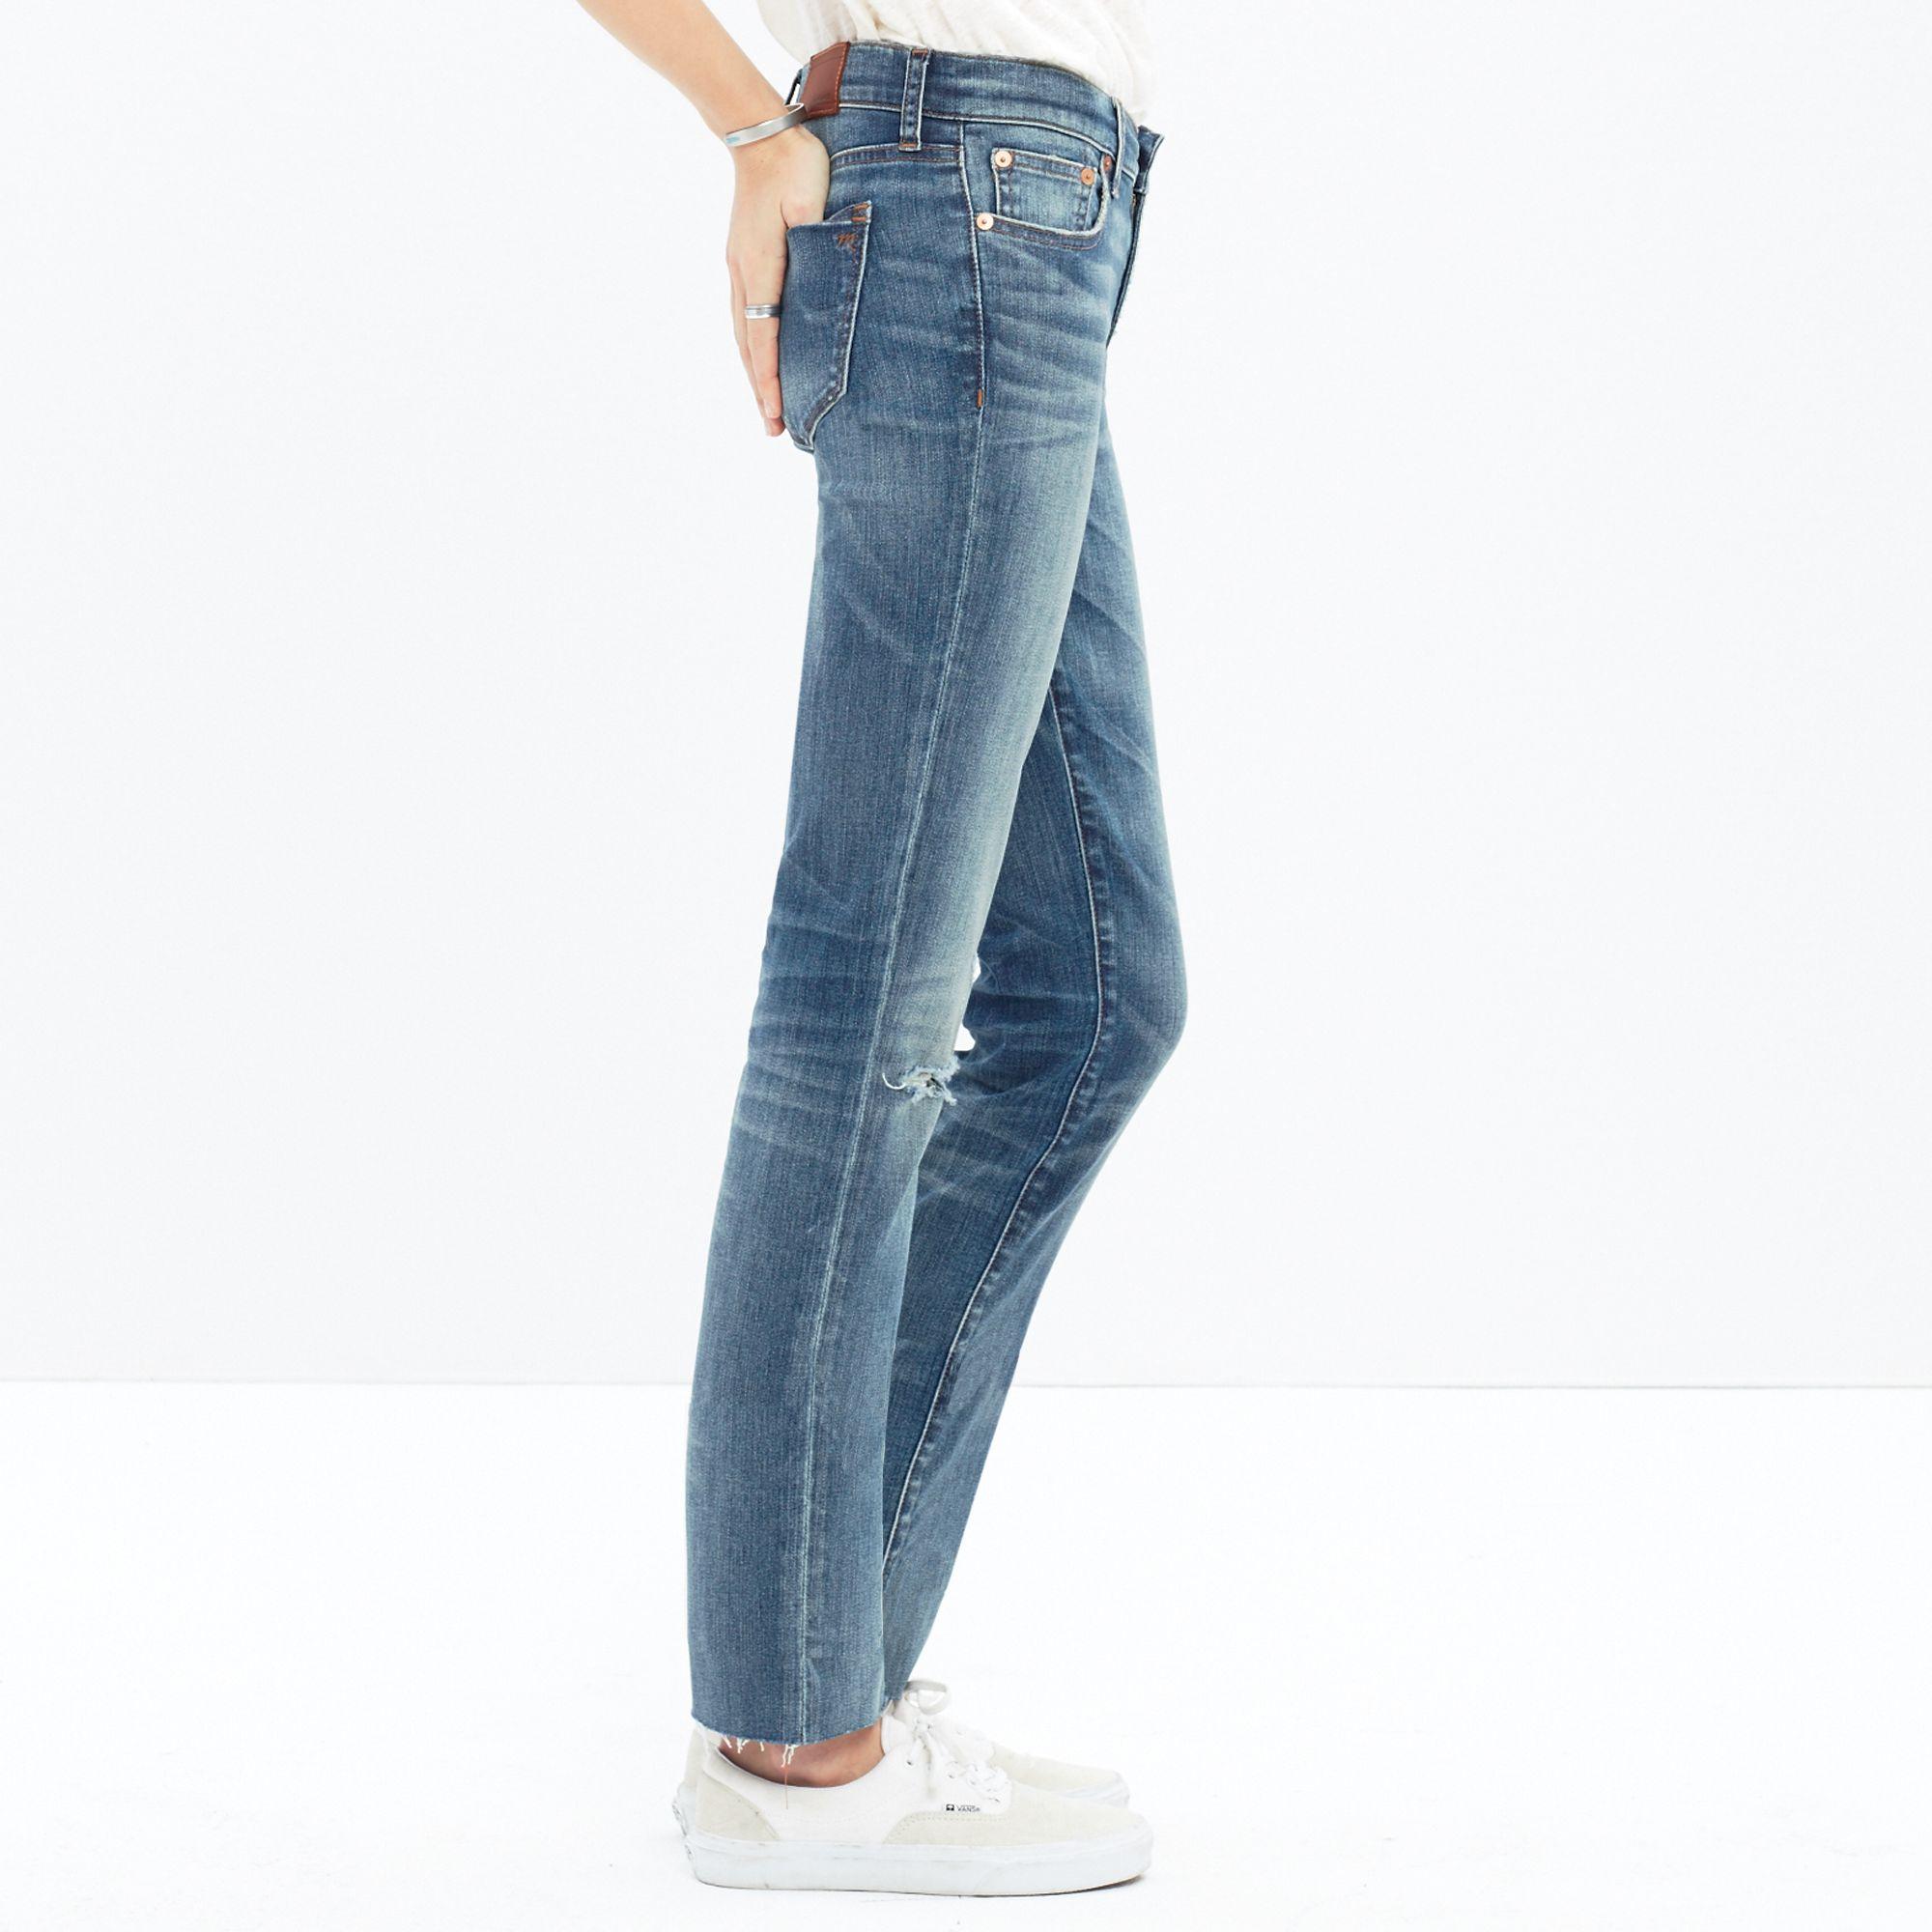 f89db2a4eb324 Lyst - Madewell Alley Straight Crop Jeans  Drop-hem Edition in Blue